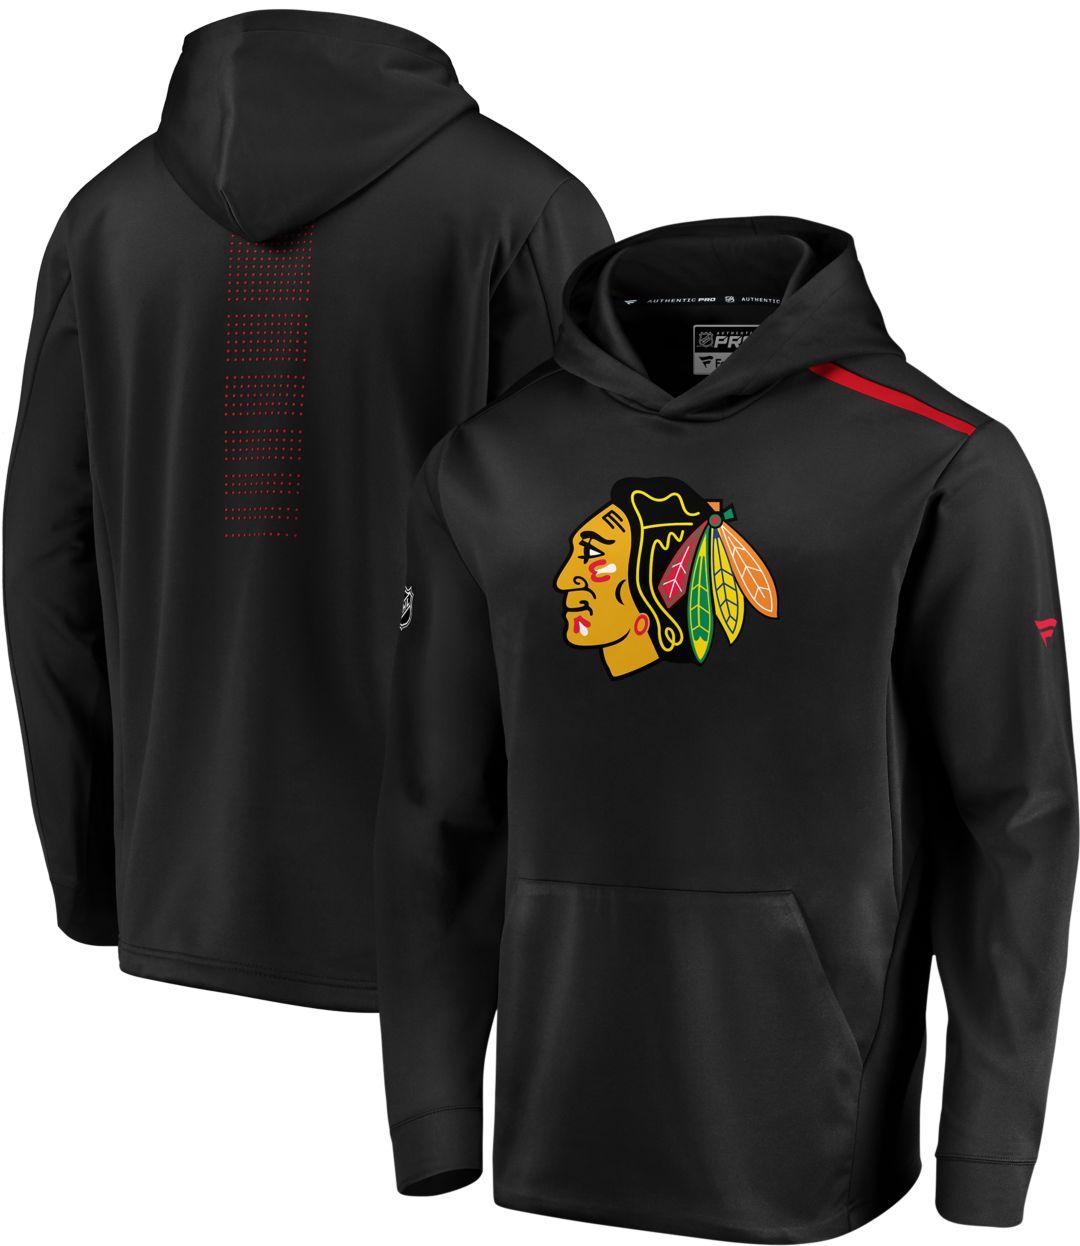 various colors b9e4a 0912b NHL Men's Chicago Blackhawks Authentic Pro Rinkside Fleece Black Pullover  Hoodie